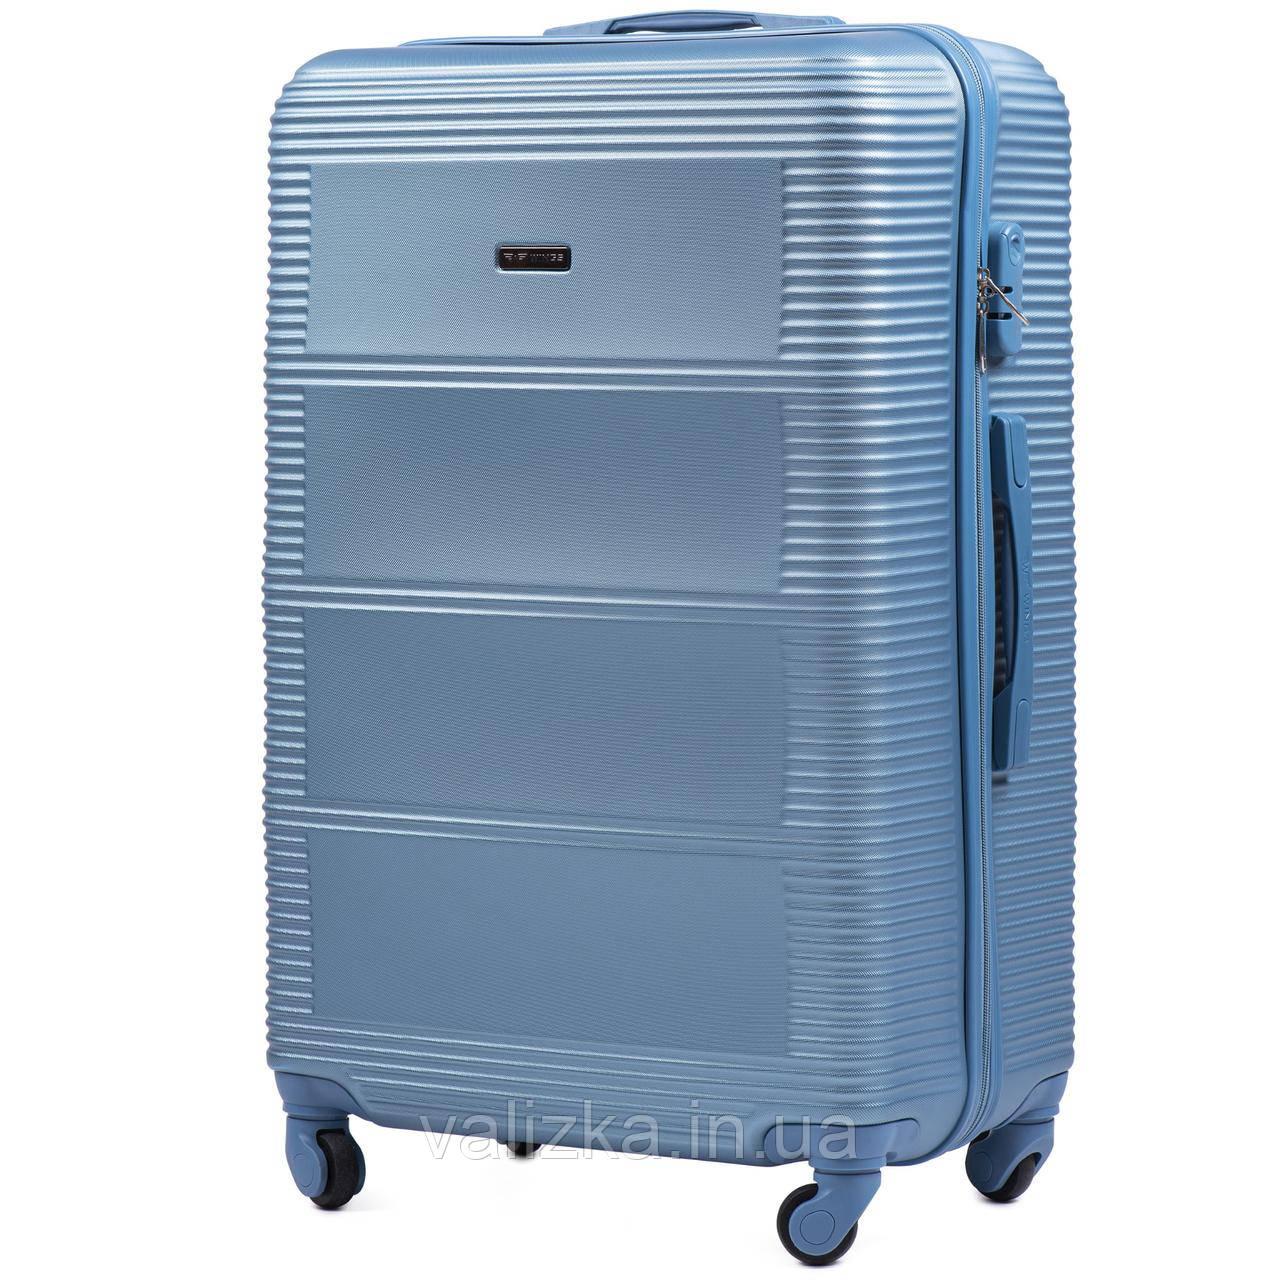 Средний чемодан из поликарбоната Wings 203 на 4-х колесах голубой